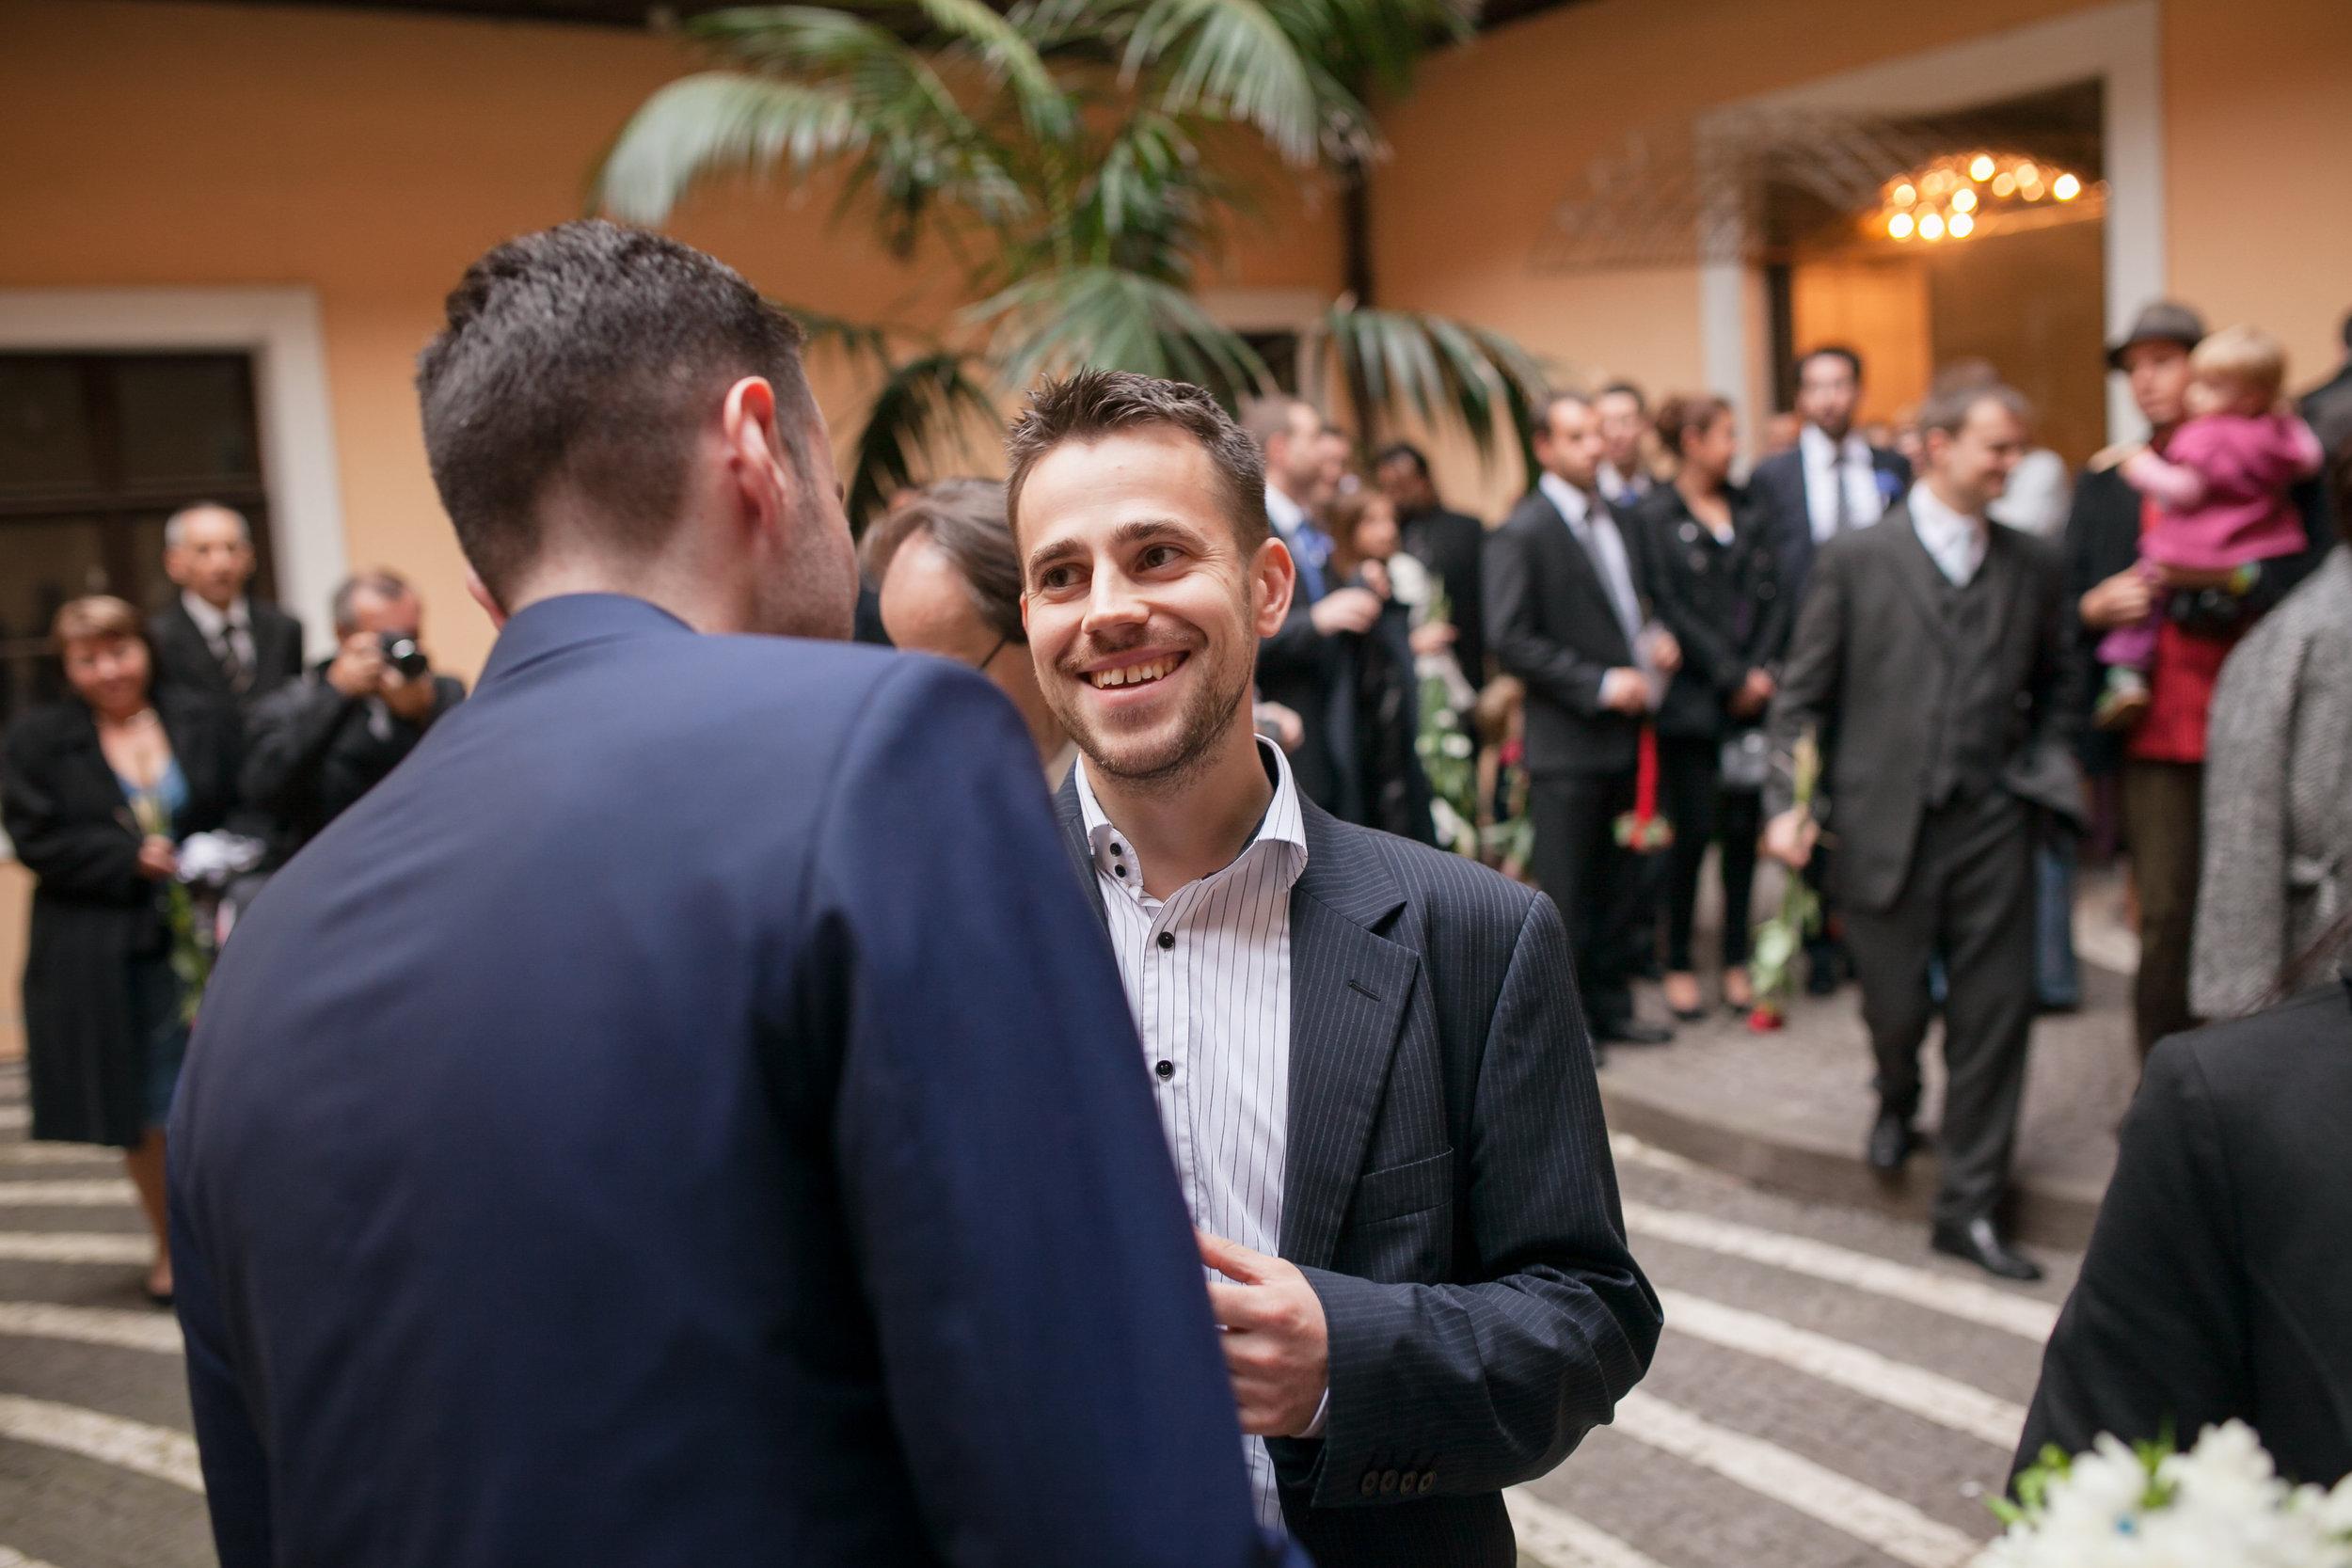 destination-wedding-photographer-slovakia-bratislava-happy-guest.jpg